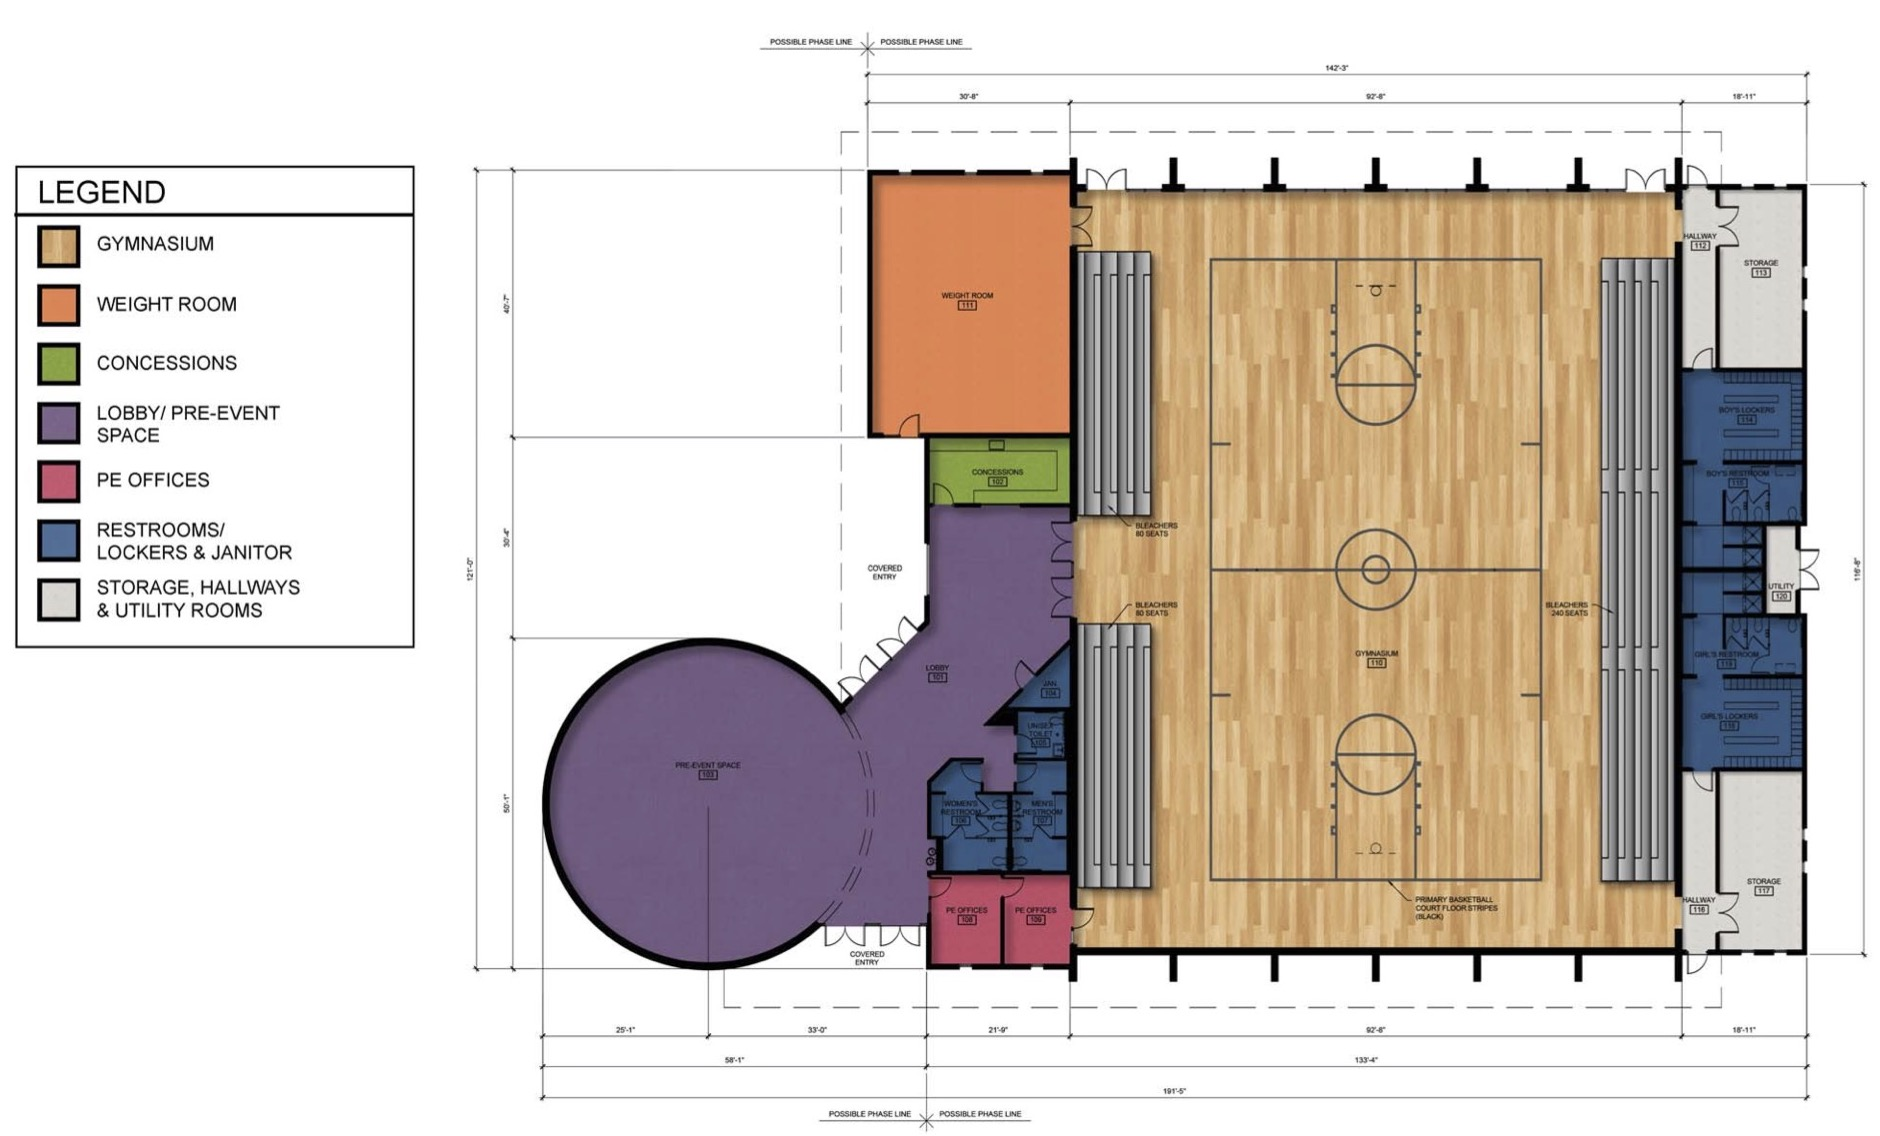 GVCC- Community Center-Gymnasium Schematic Design Drawings 10.9.19 2